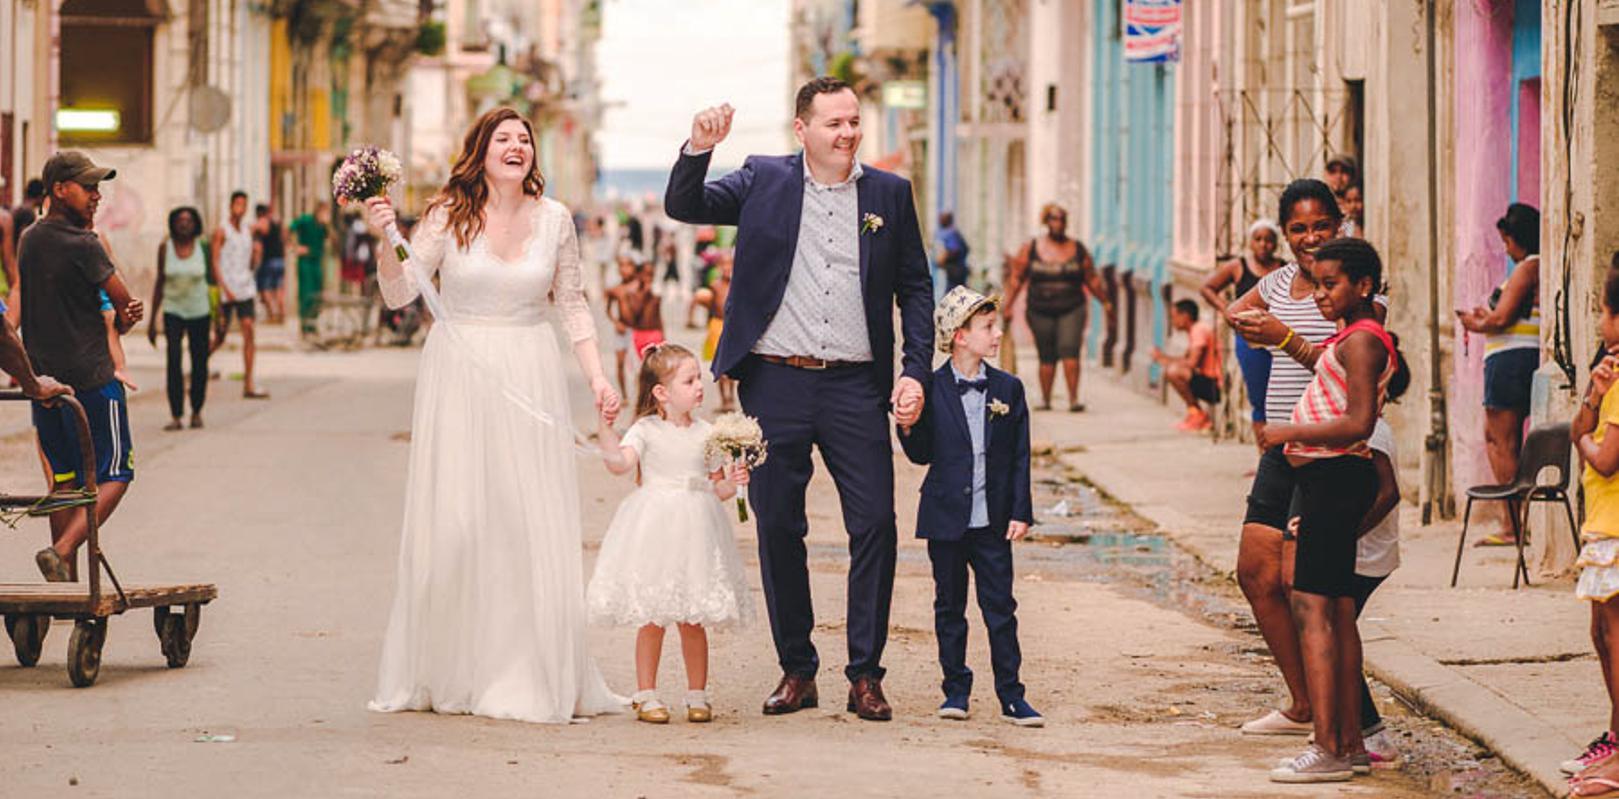 bodas-sin-clasificar-sin-tema-cuba-42391.jpg